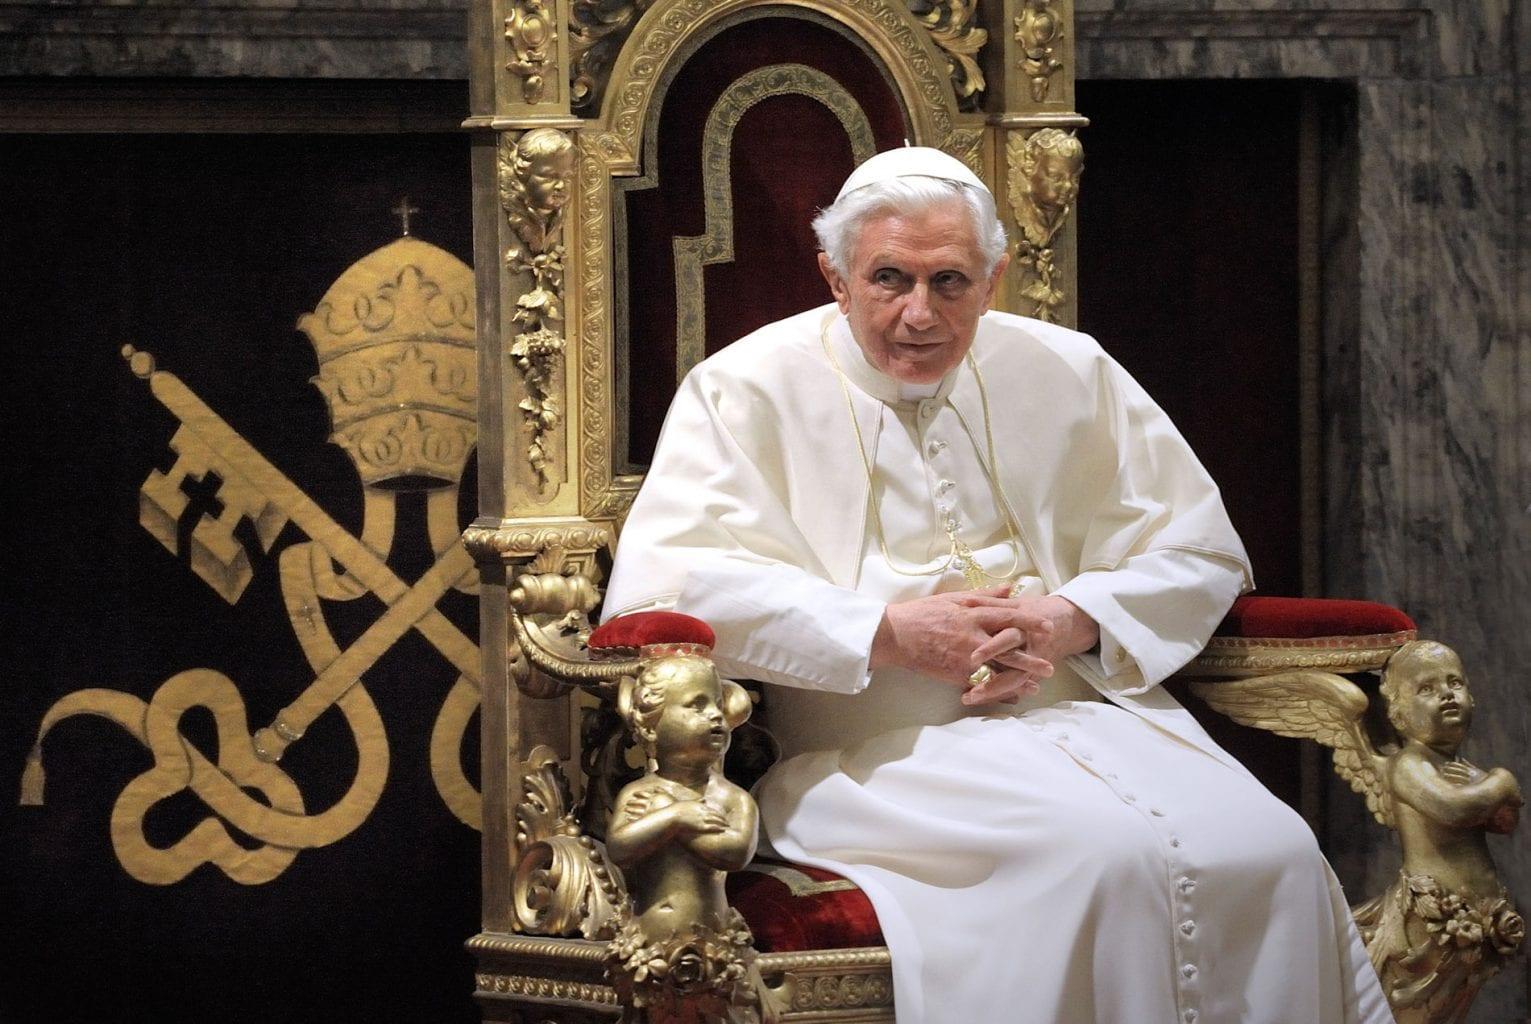 Dictatorship of Relativism – Cardinal Ratzinger